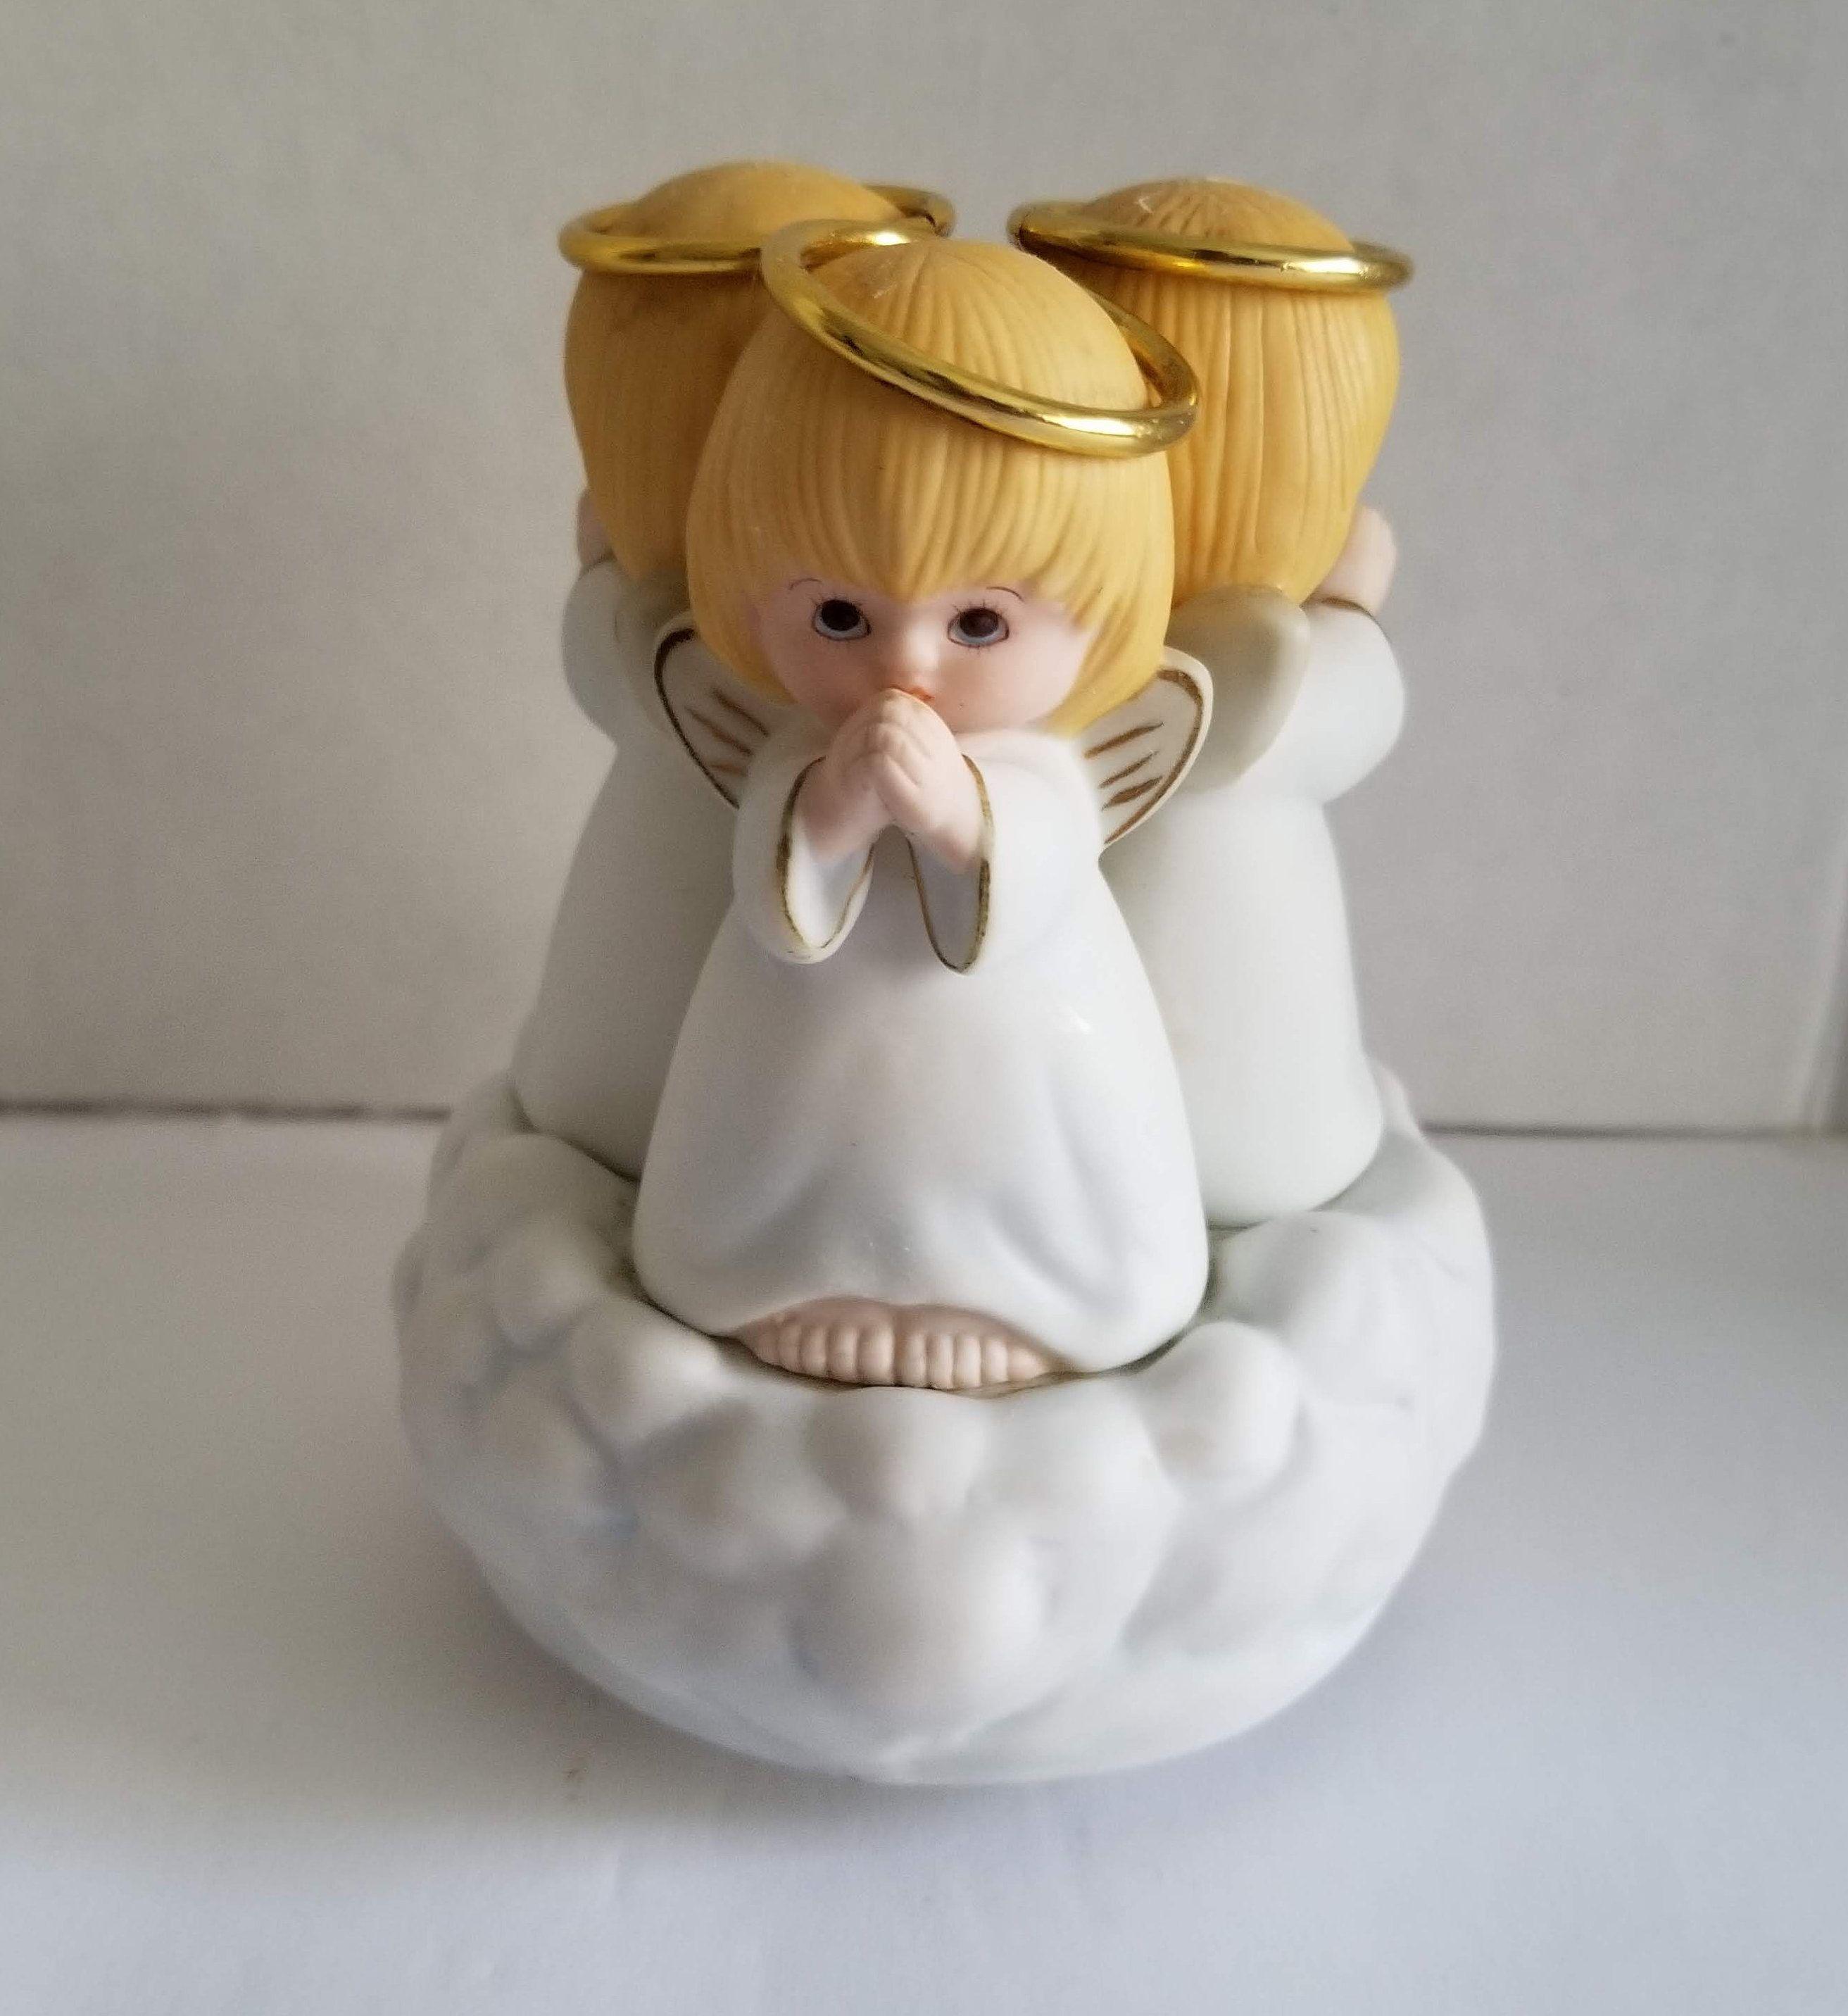 Hallmark Heart Shaped Three Angels Praying porcelain jewelry box vintage 1980s